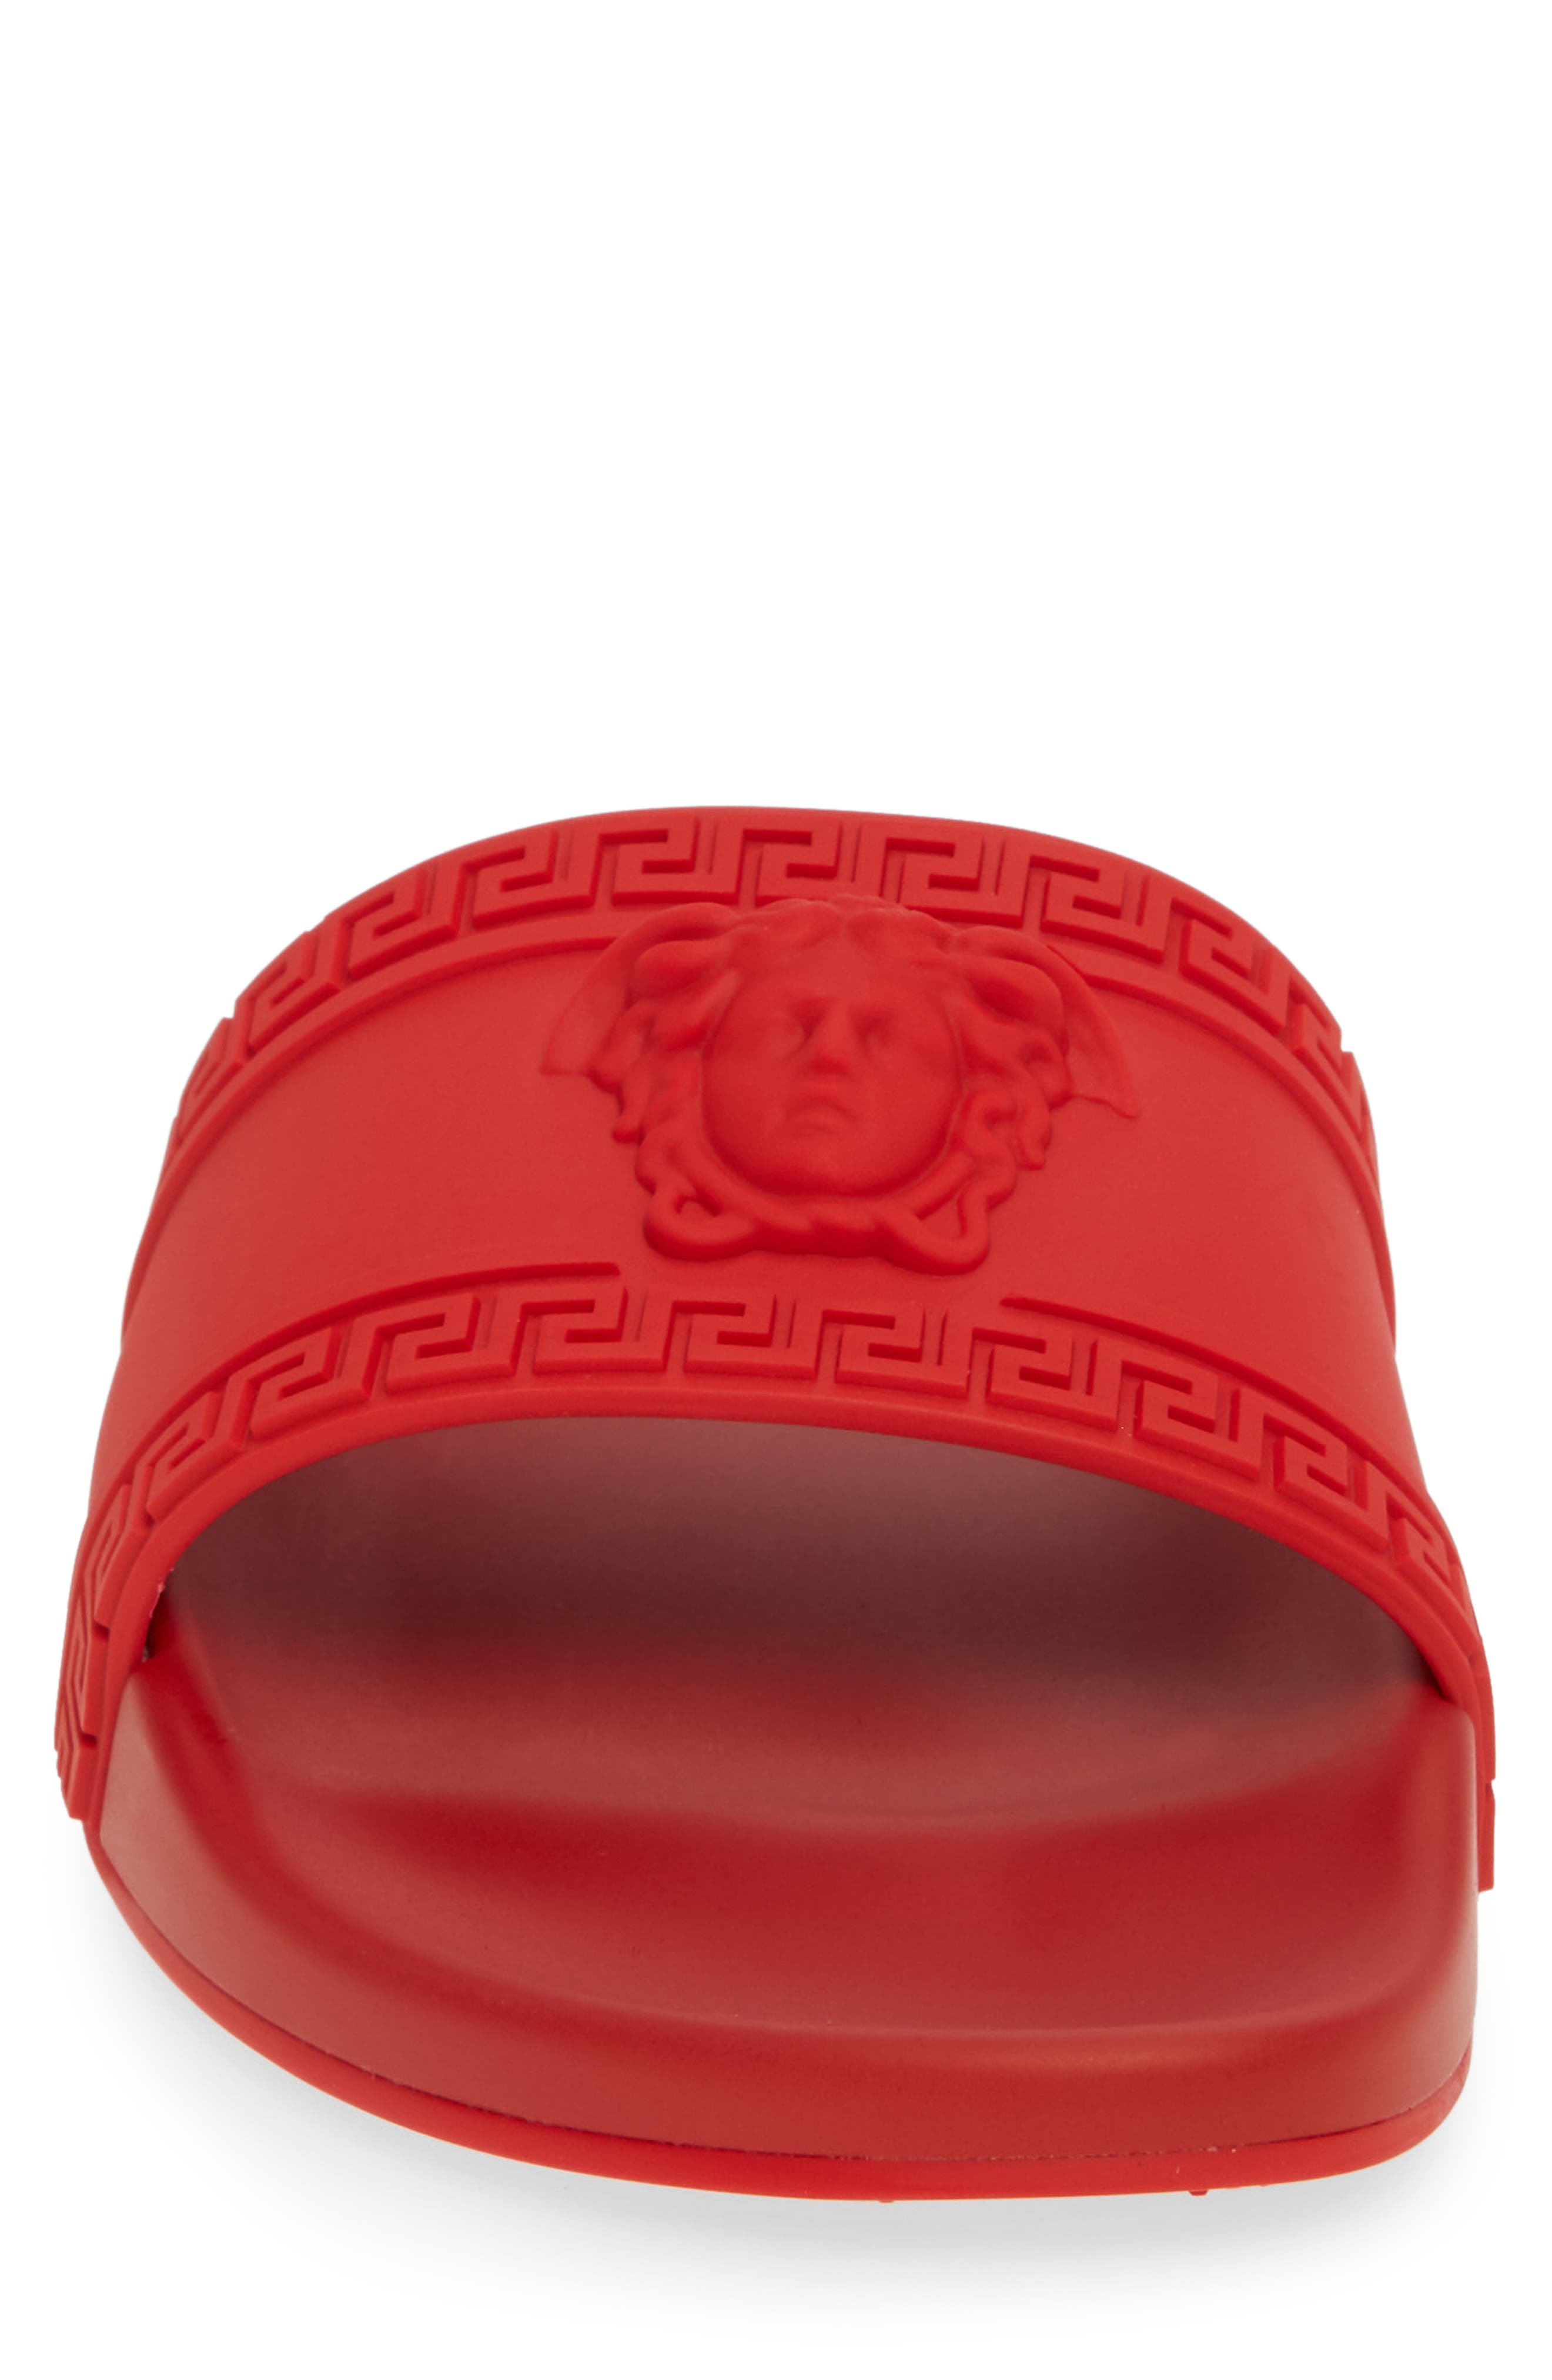 VERSACE, Palazzo Medusa Slide Sandal, Alternate thumbnail 4, color, RED